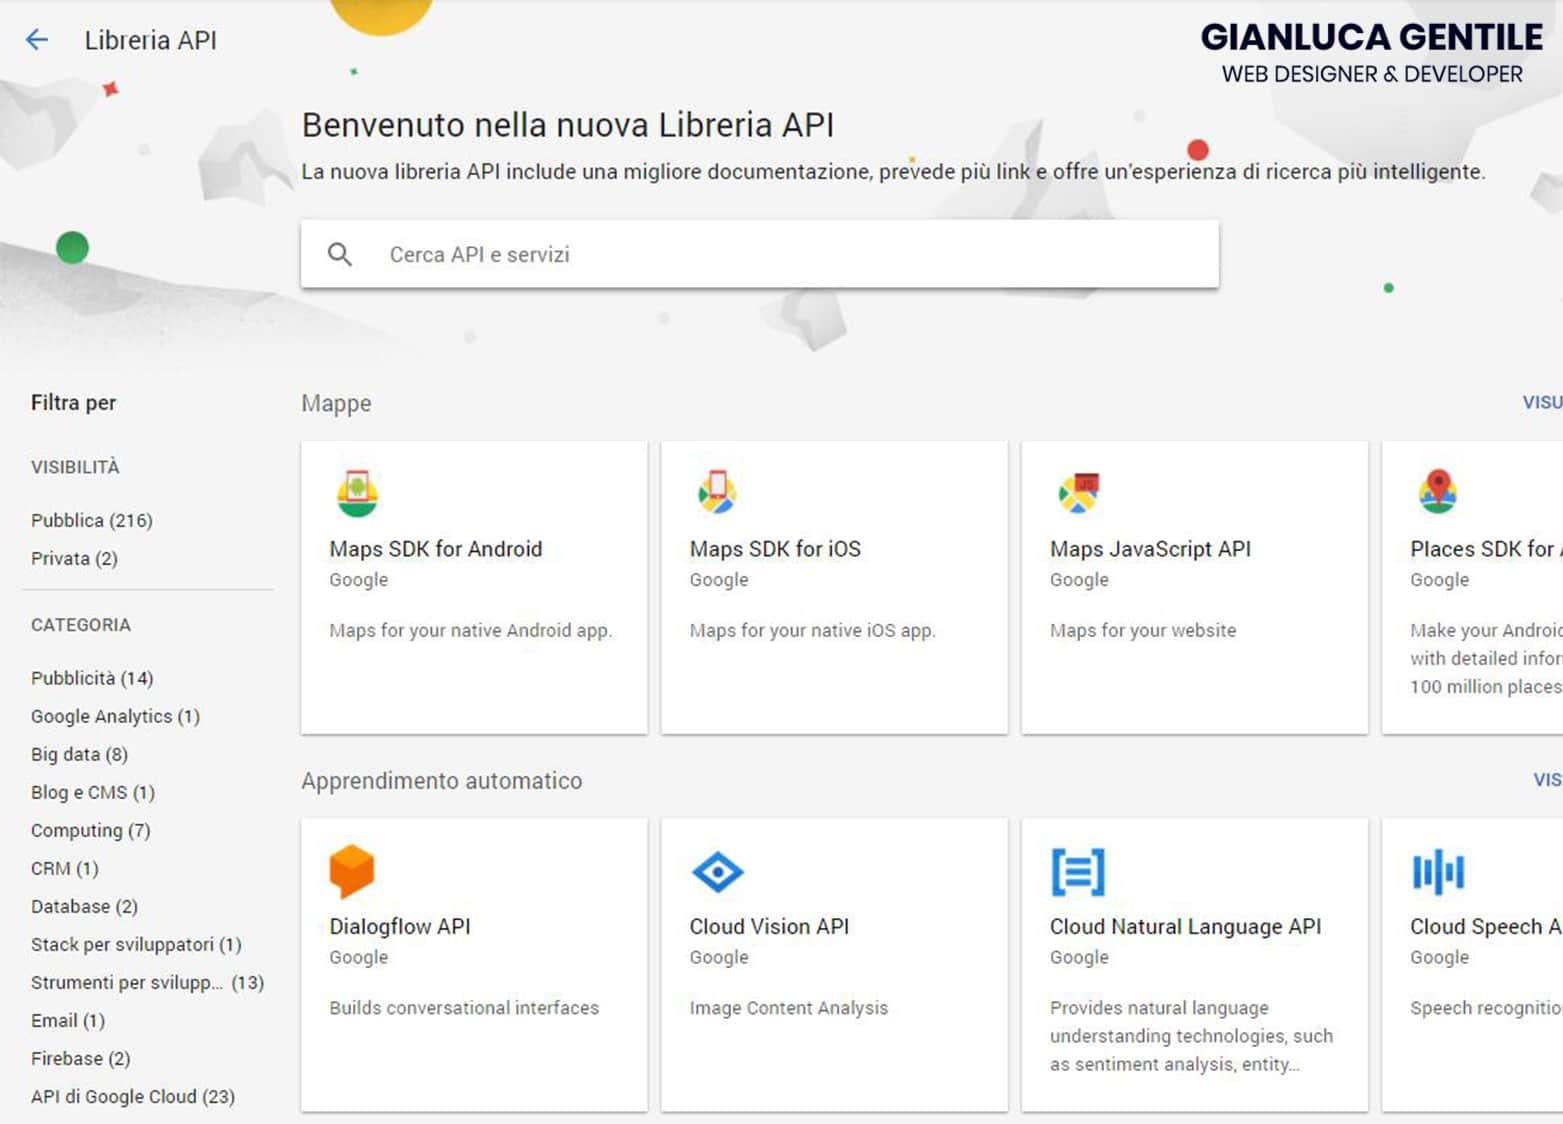 api google cosa sono - API Google cosa sono e come funzionano - API Google cosa sono e come funzionano